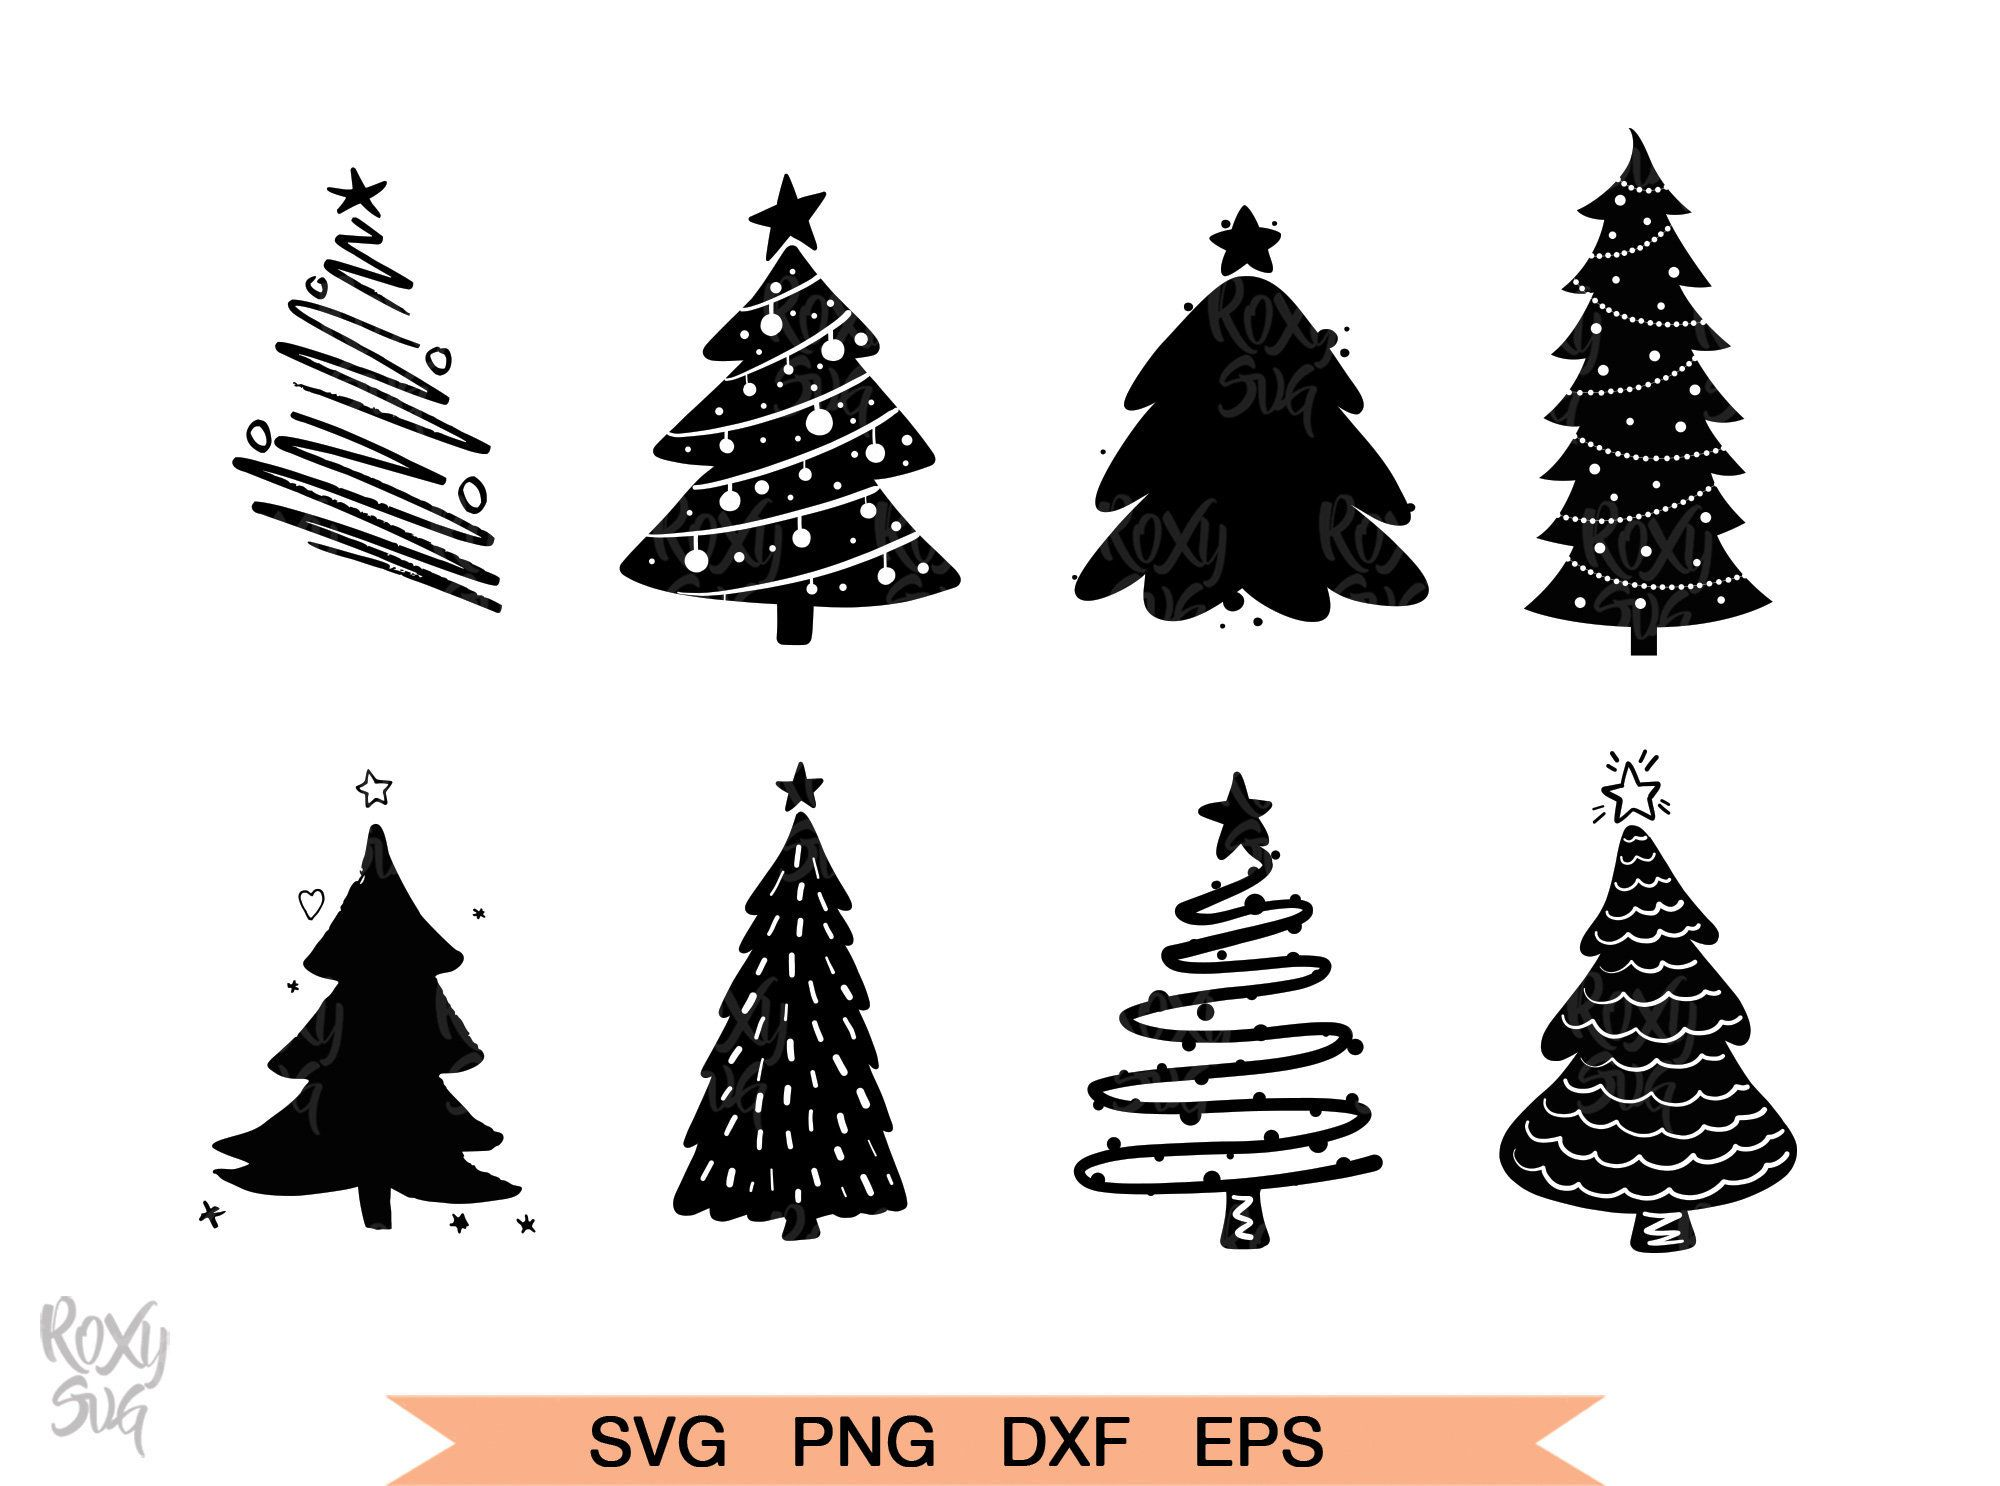 Christmas Tree Svg Christmas Svg Christmas Tree Silhouette Etsy In 2020 Christmas Tree Silhouette Christmas Tree Clipart Christmas Svg